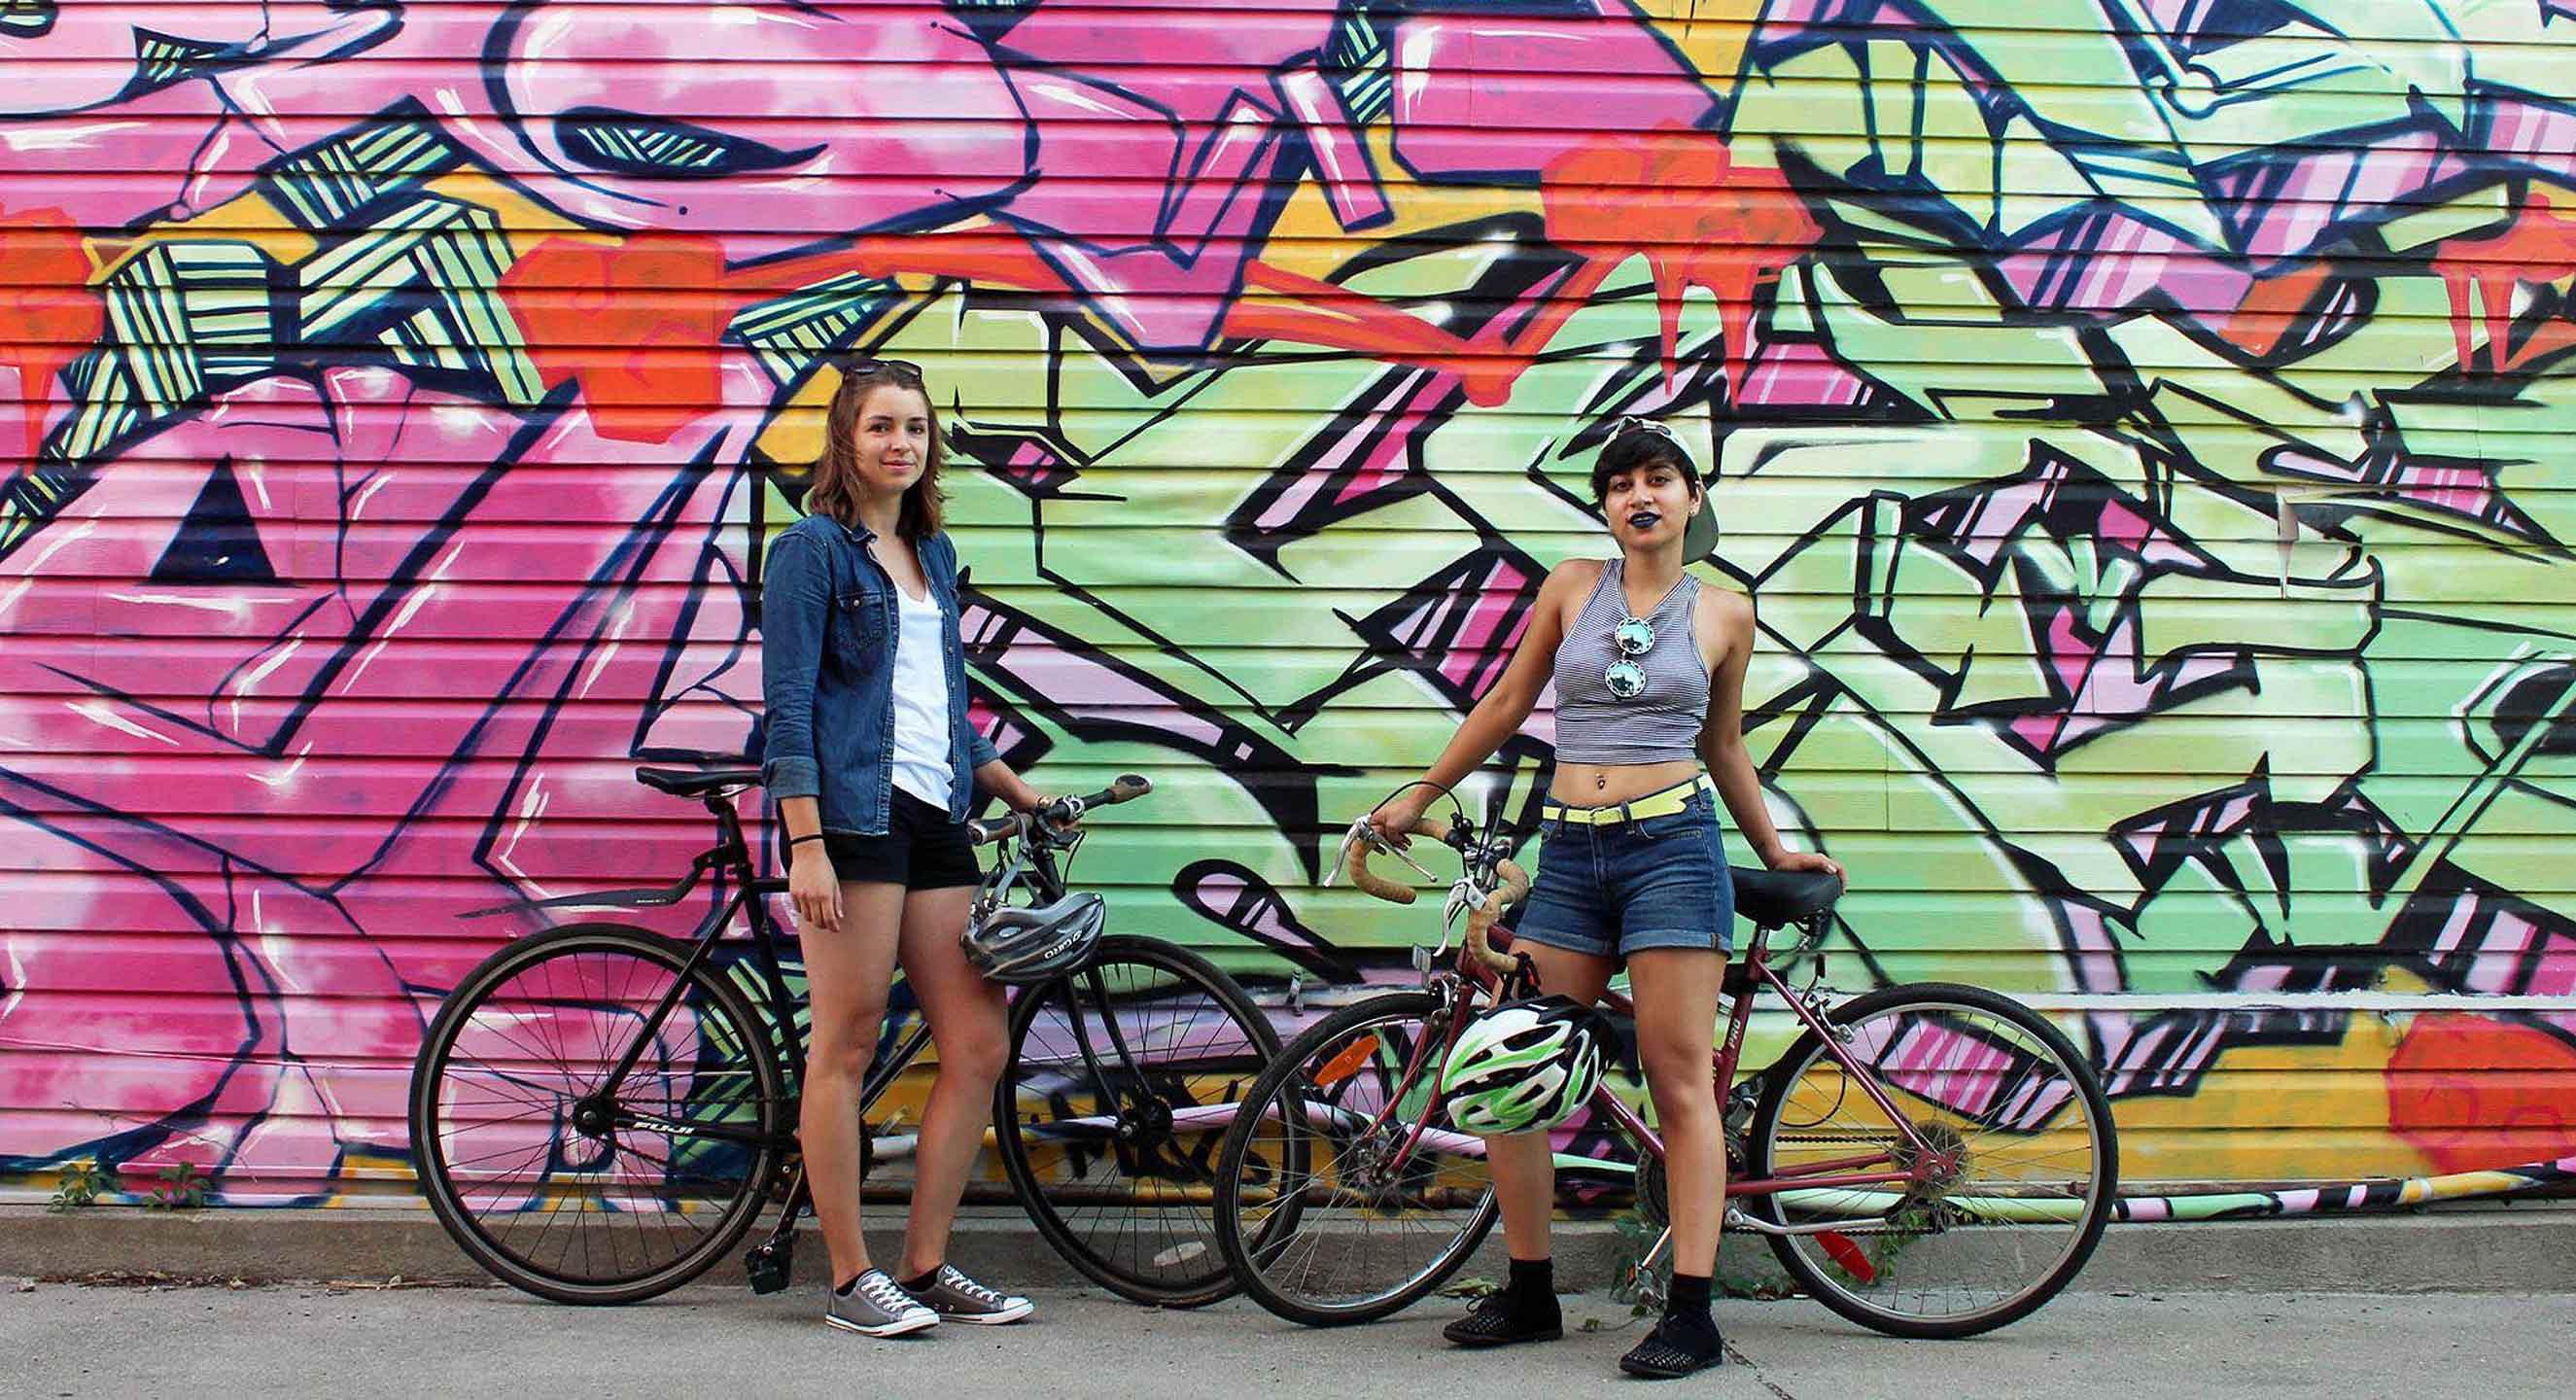 The Bad Girls Bike Club co-creators, Claire McFarlane and Lavinia Tanzim. PHOTO COURTESY: BAD GIRL BIKE CLUB